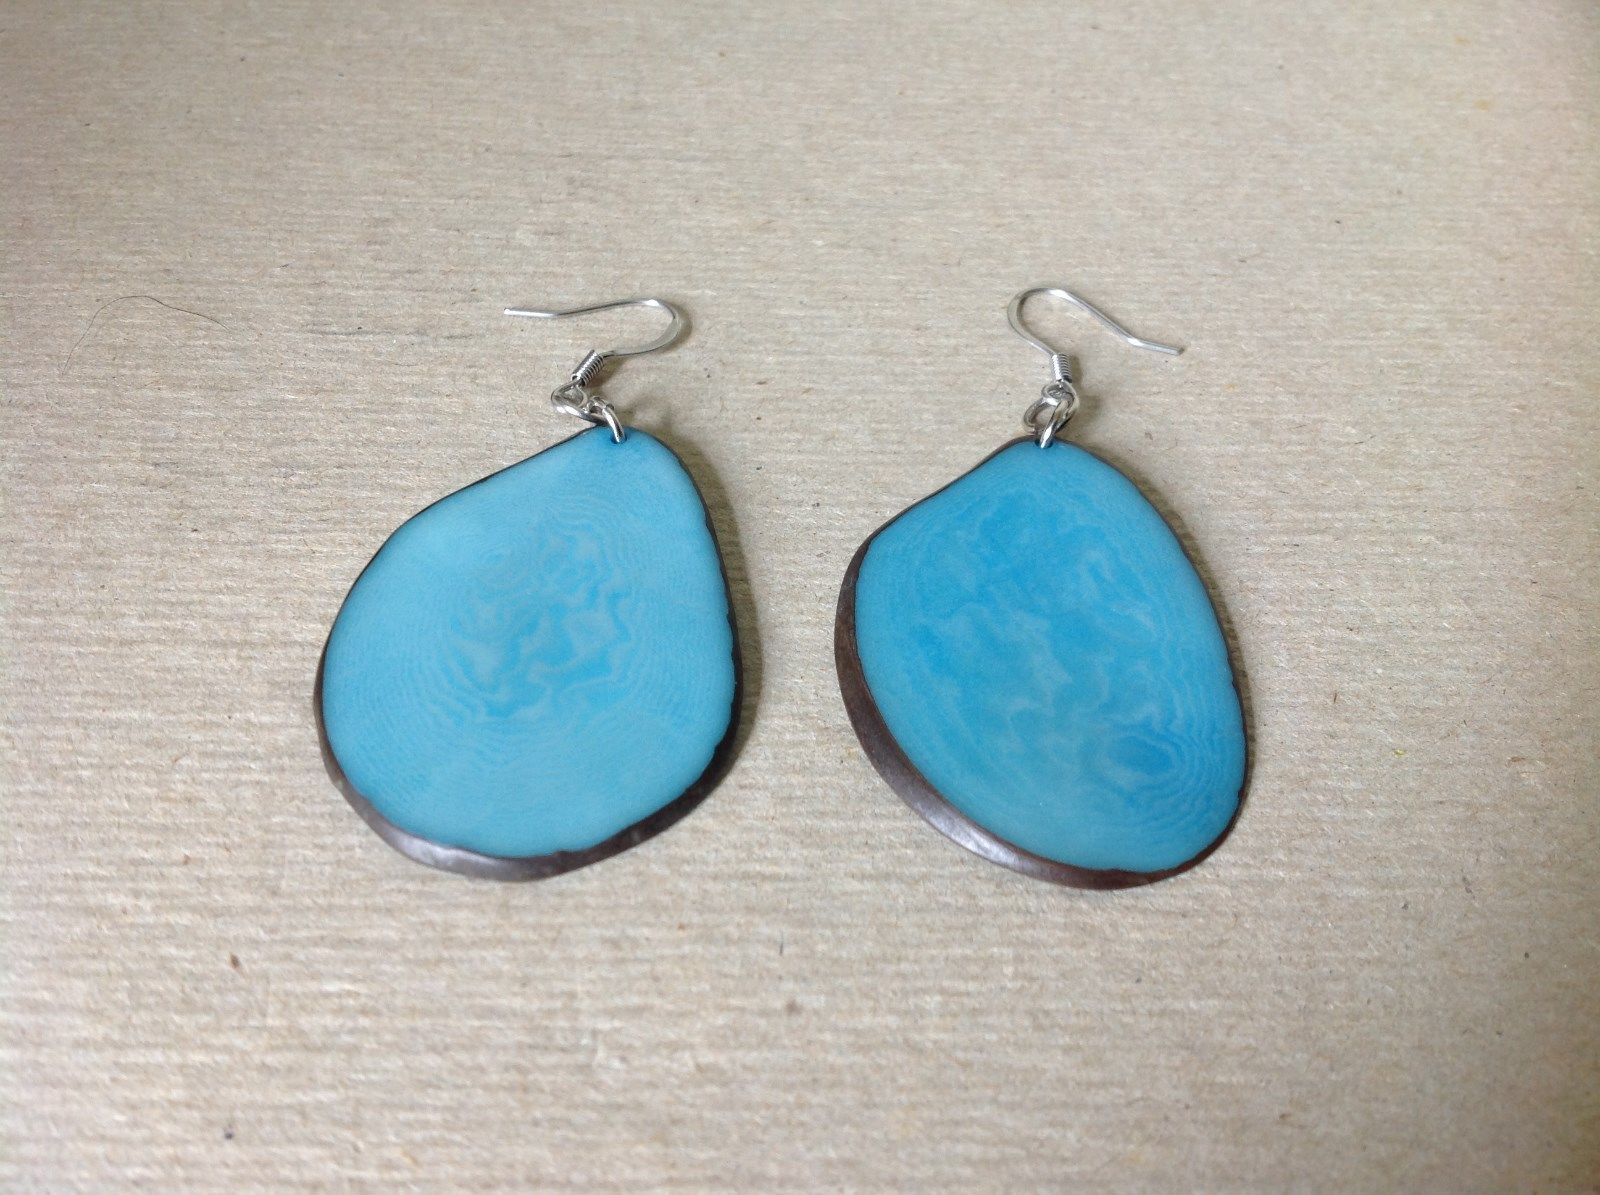 Light Blue Flat Tagua Earrings Dyes Handmade Black Outline Dangling